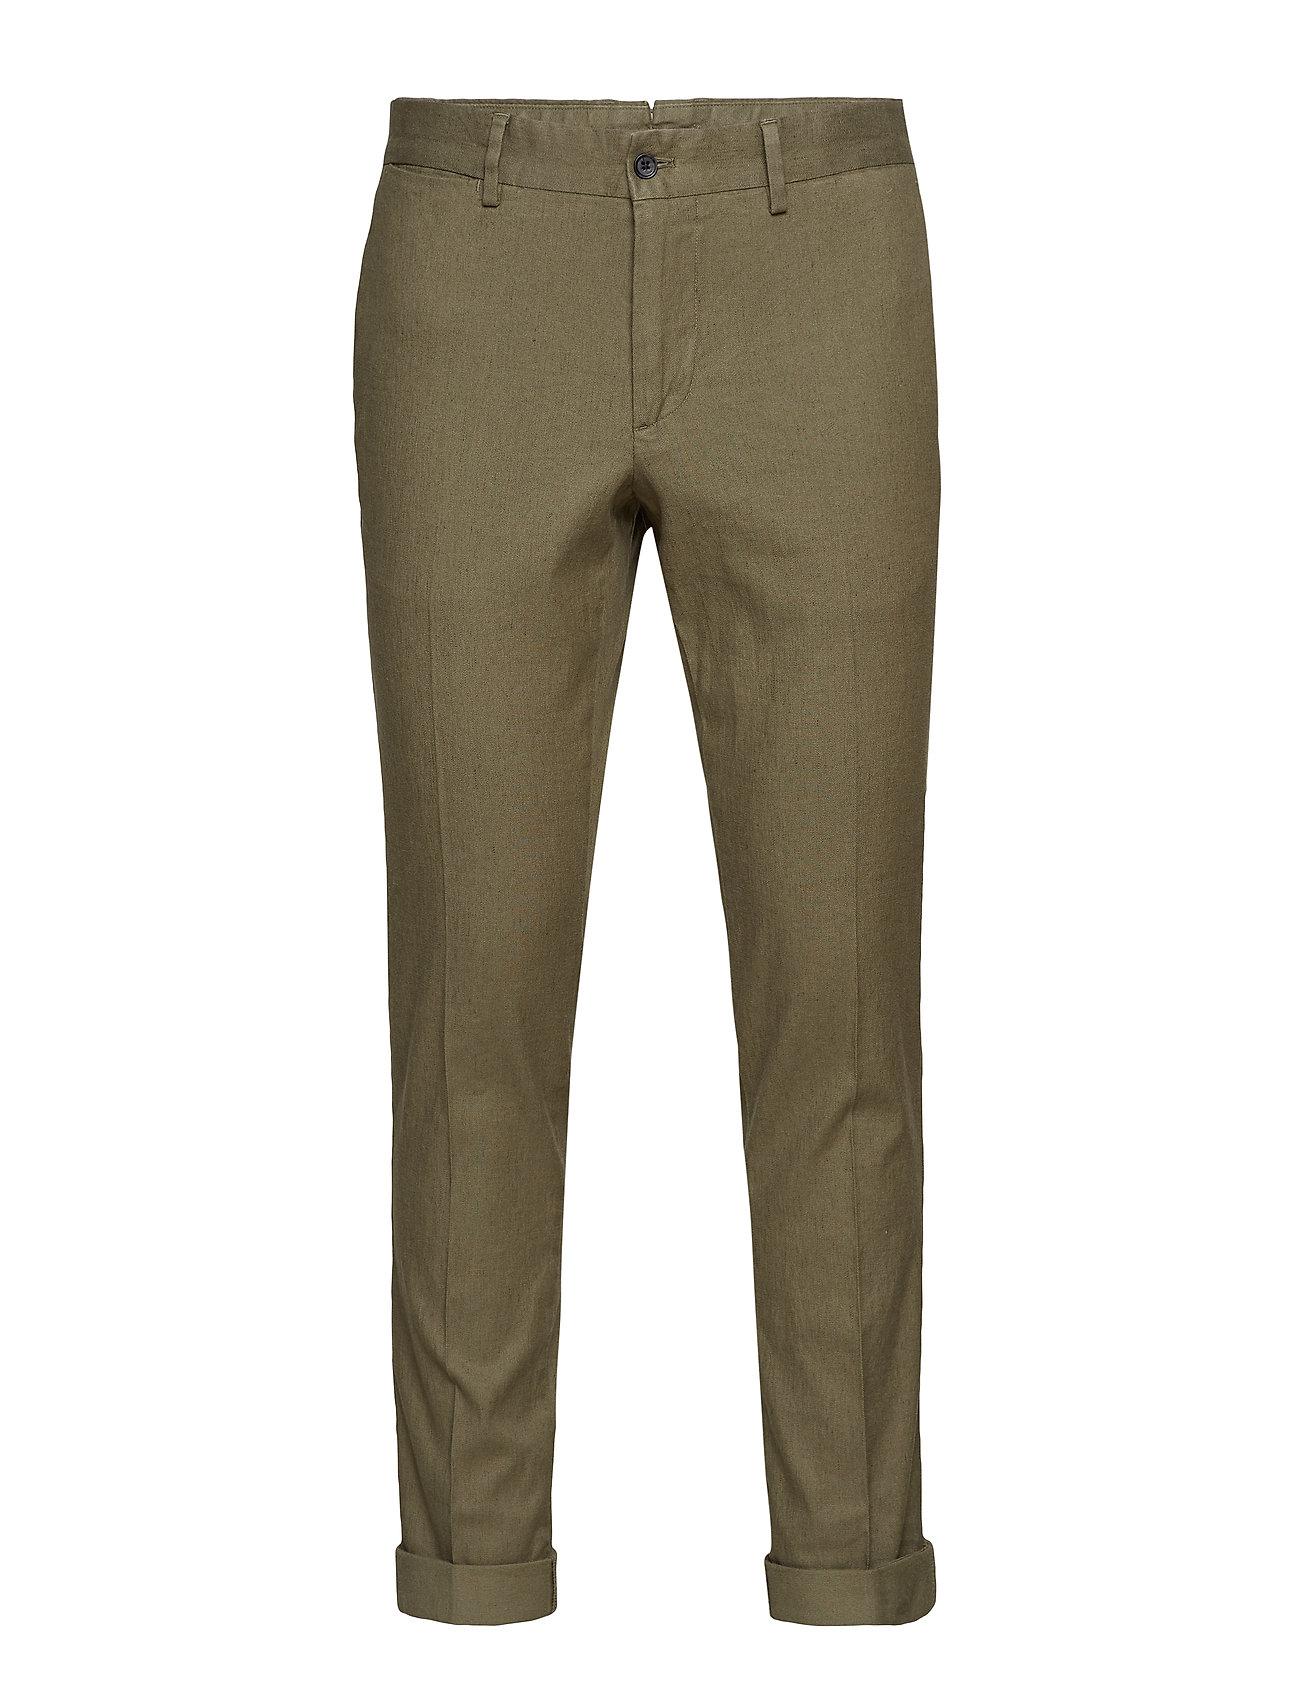 J. Lindeberg Grant Cotton Linen Stretch - IVY GREEN